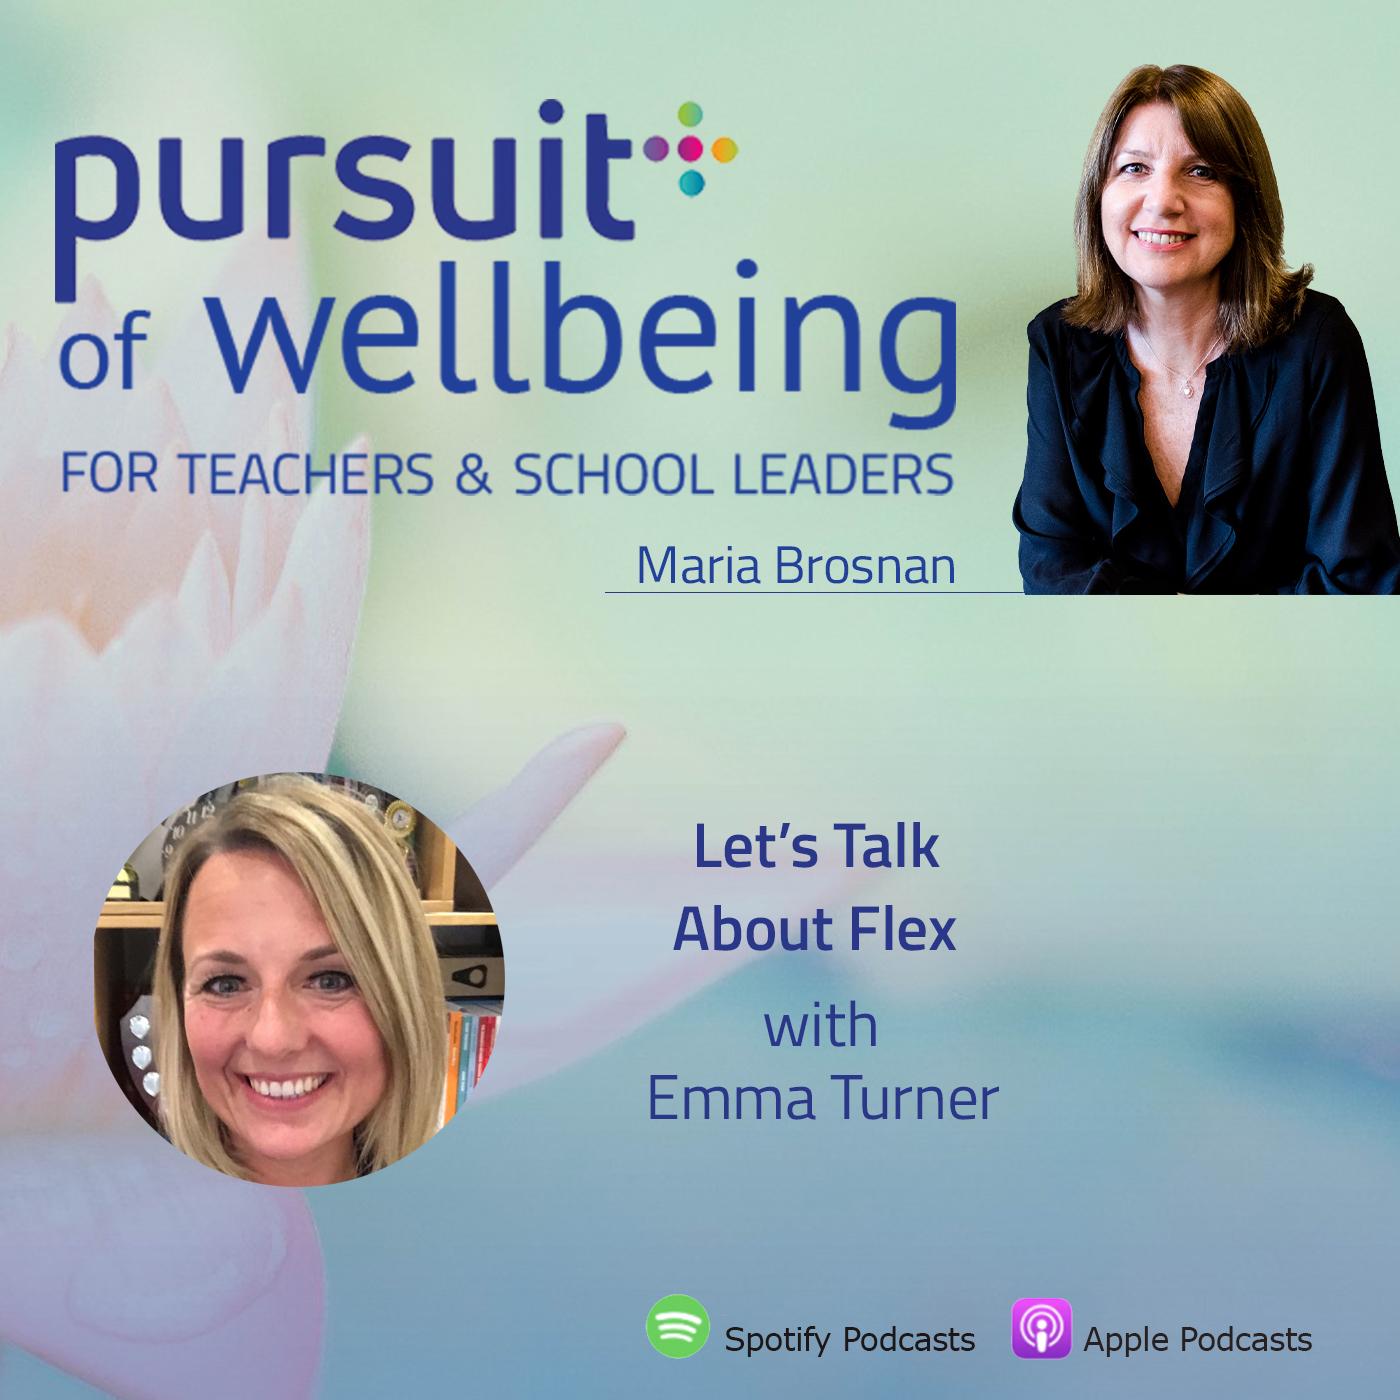 Let's Talk About Flex with Emma Turner